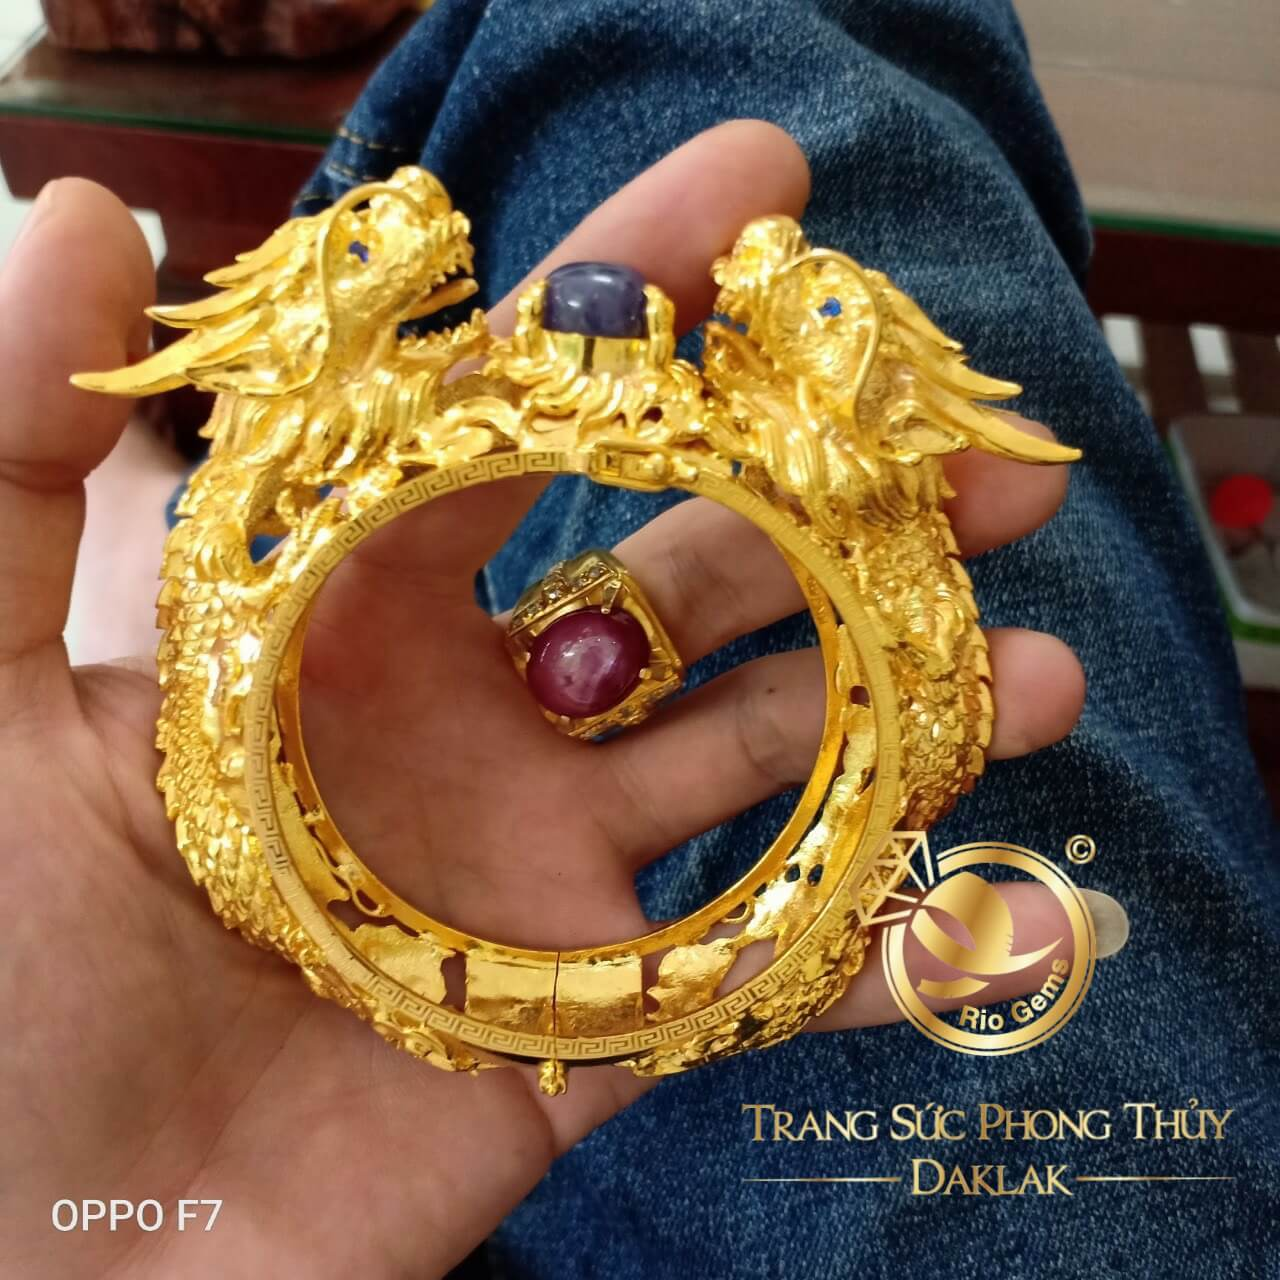 vong-tay-2-rong-vang-khung-sapphire-riogems